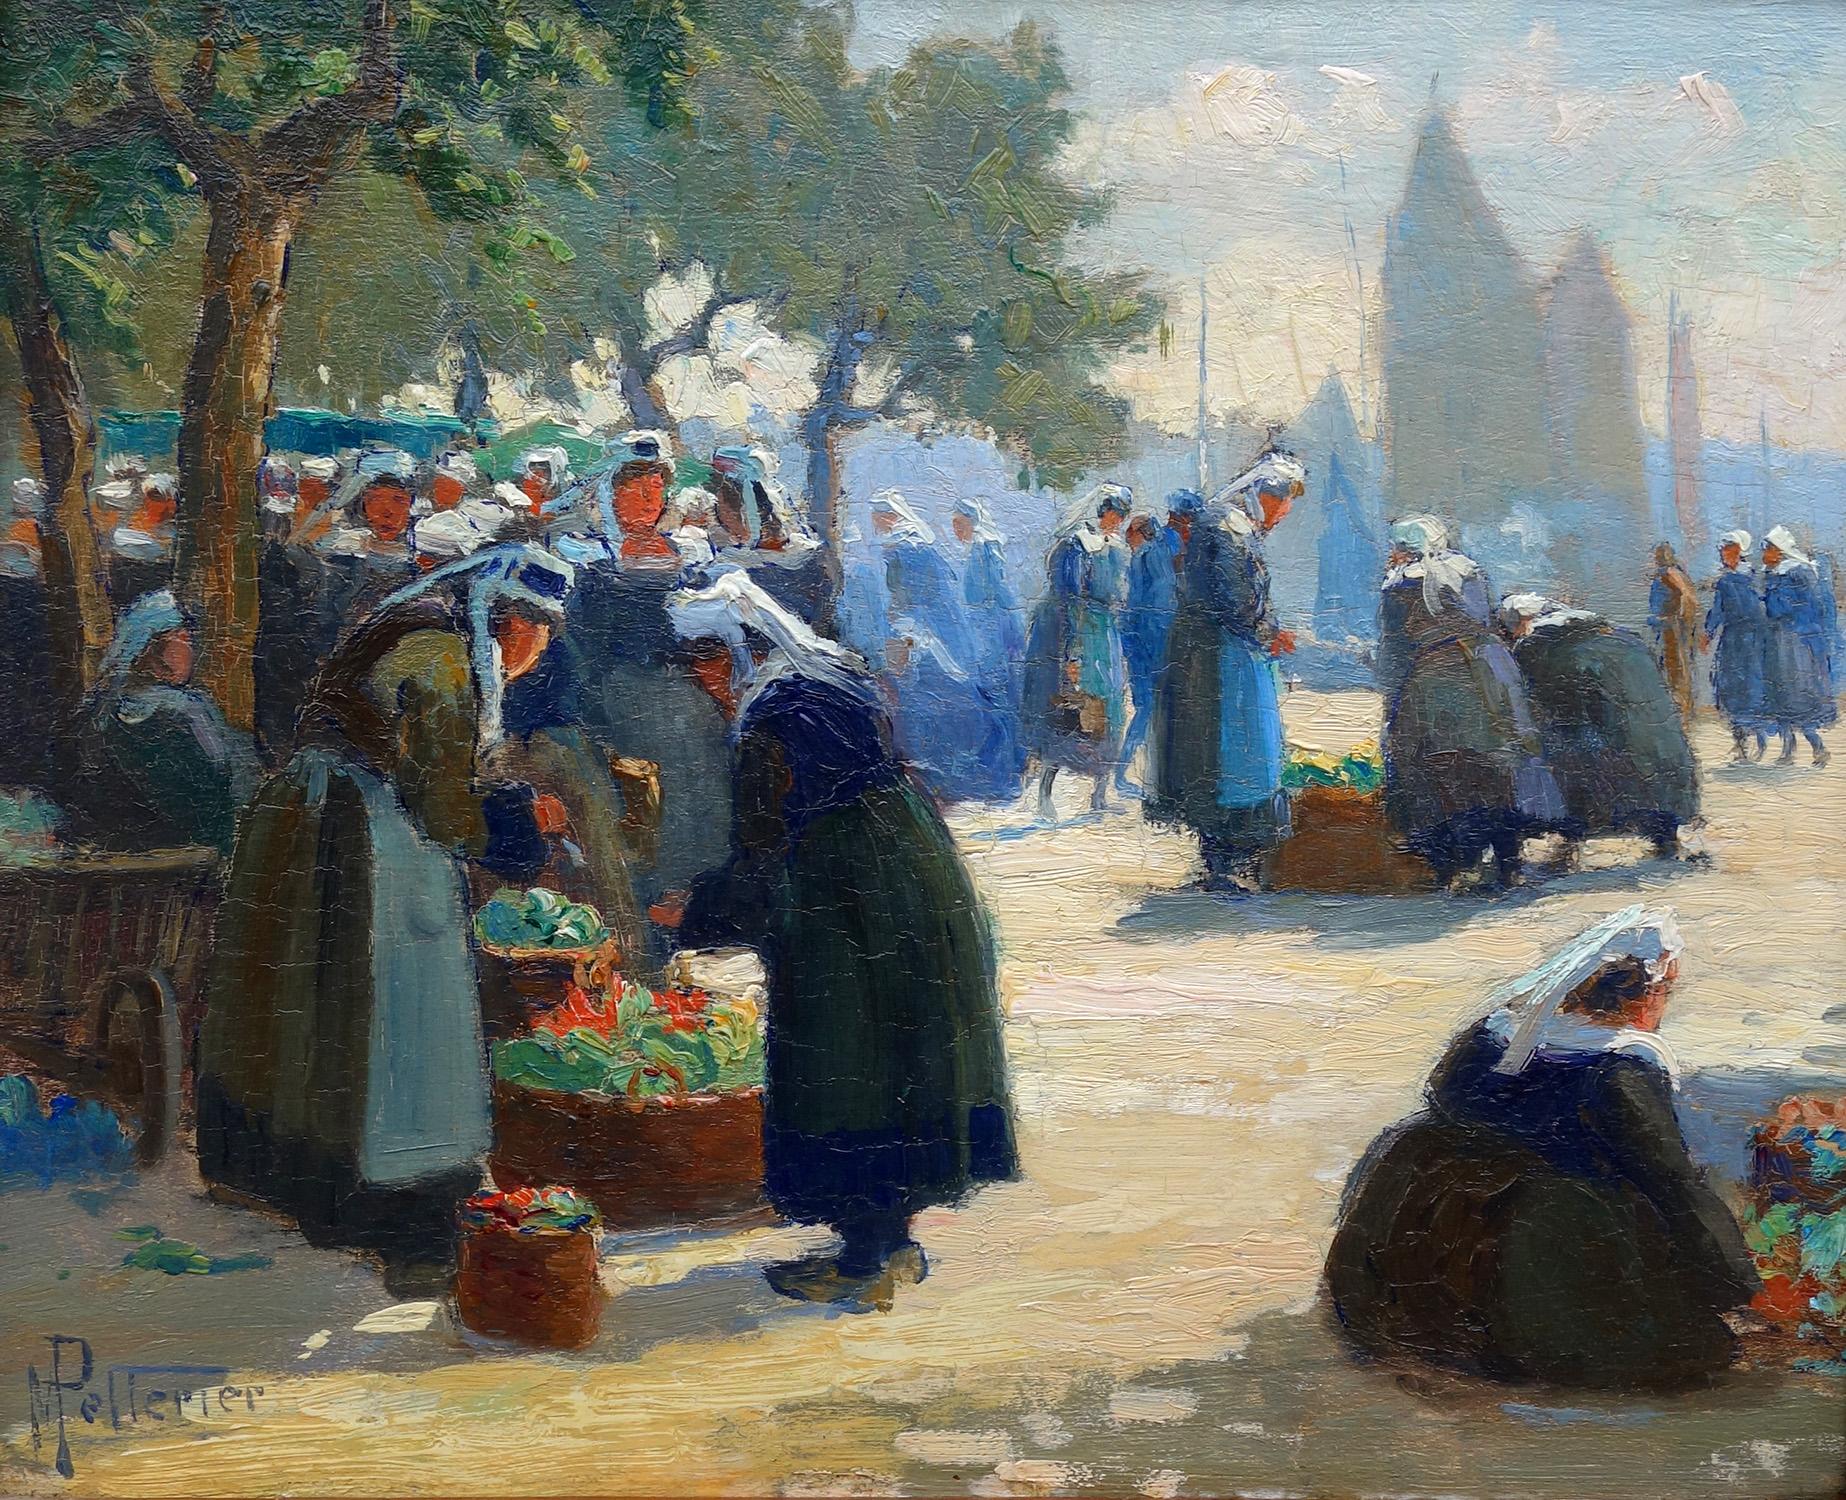 Markt in Concarneau, Bretagne- Maurice Pellerier